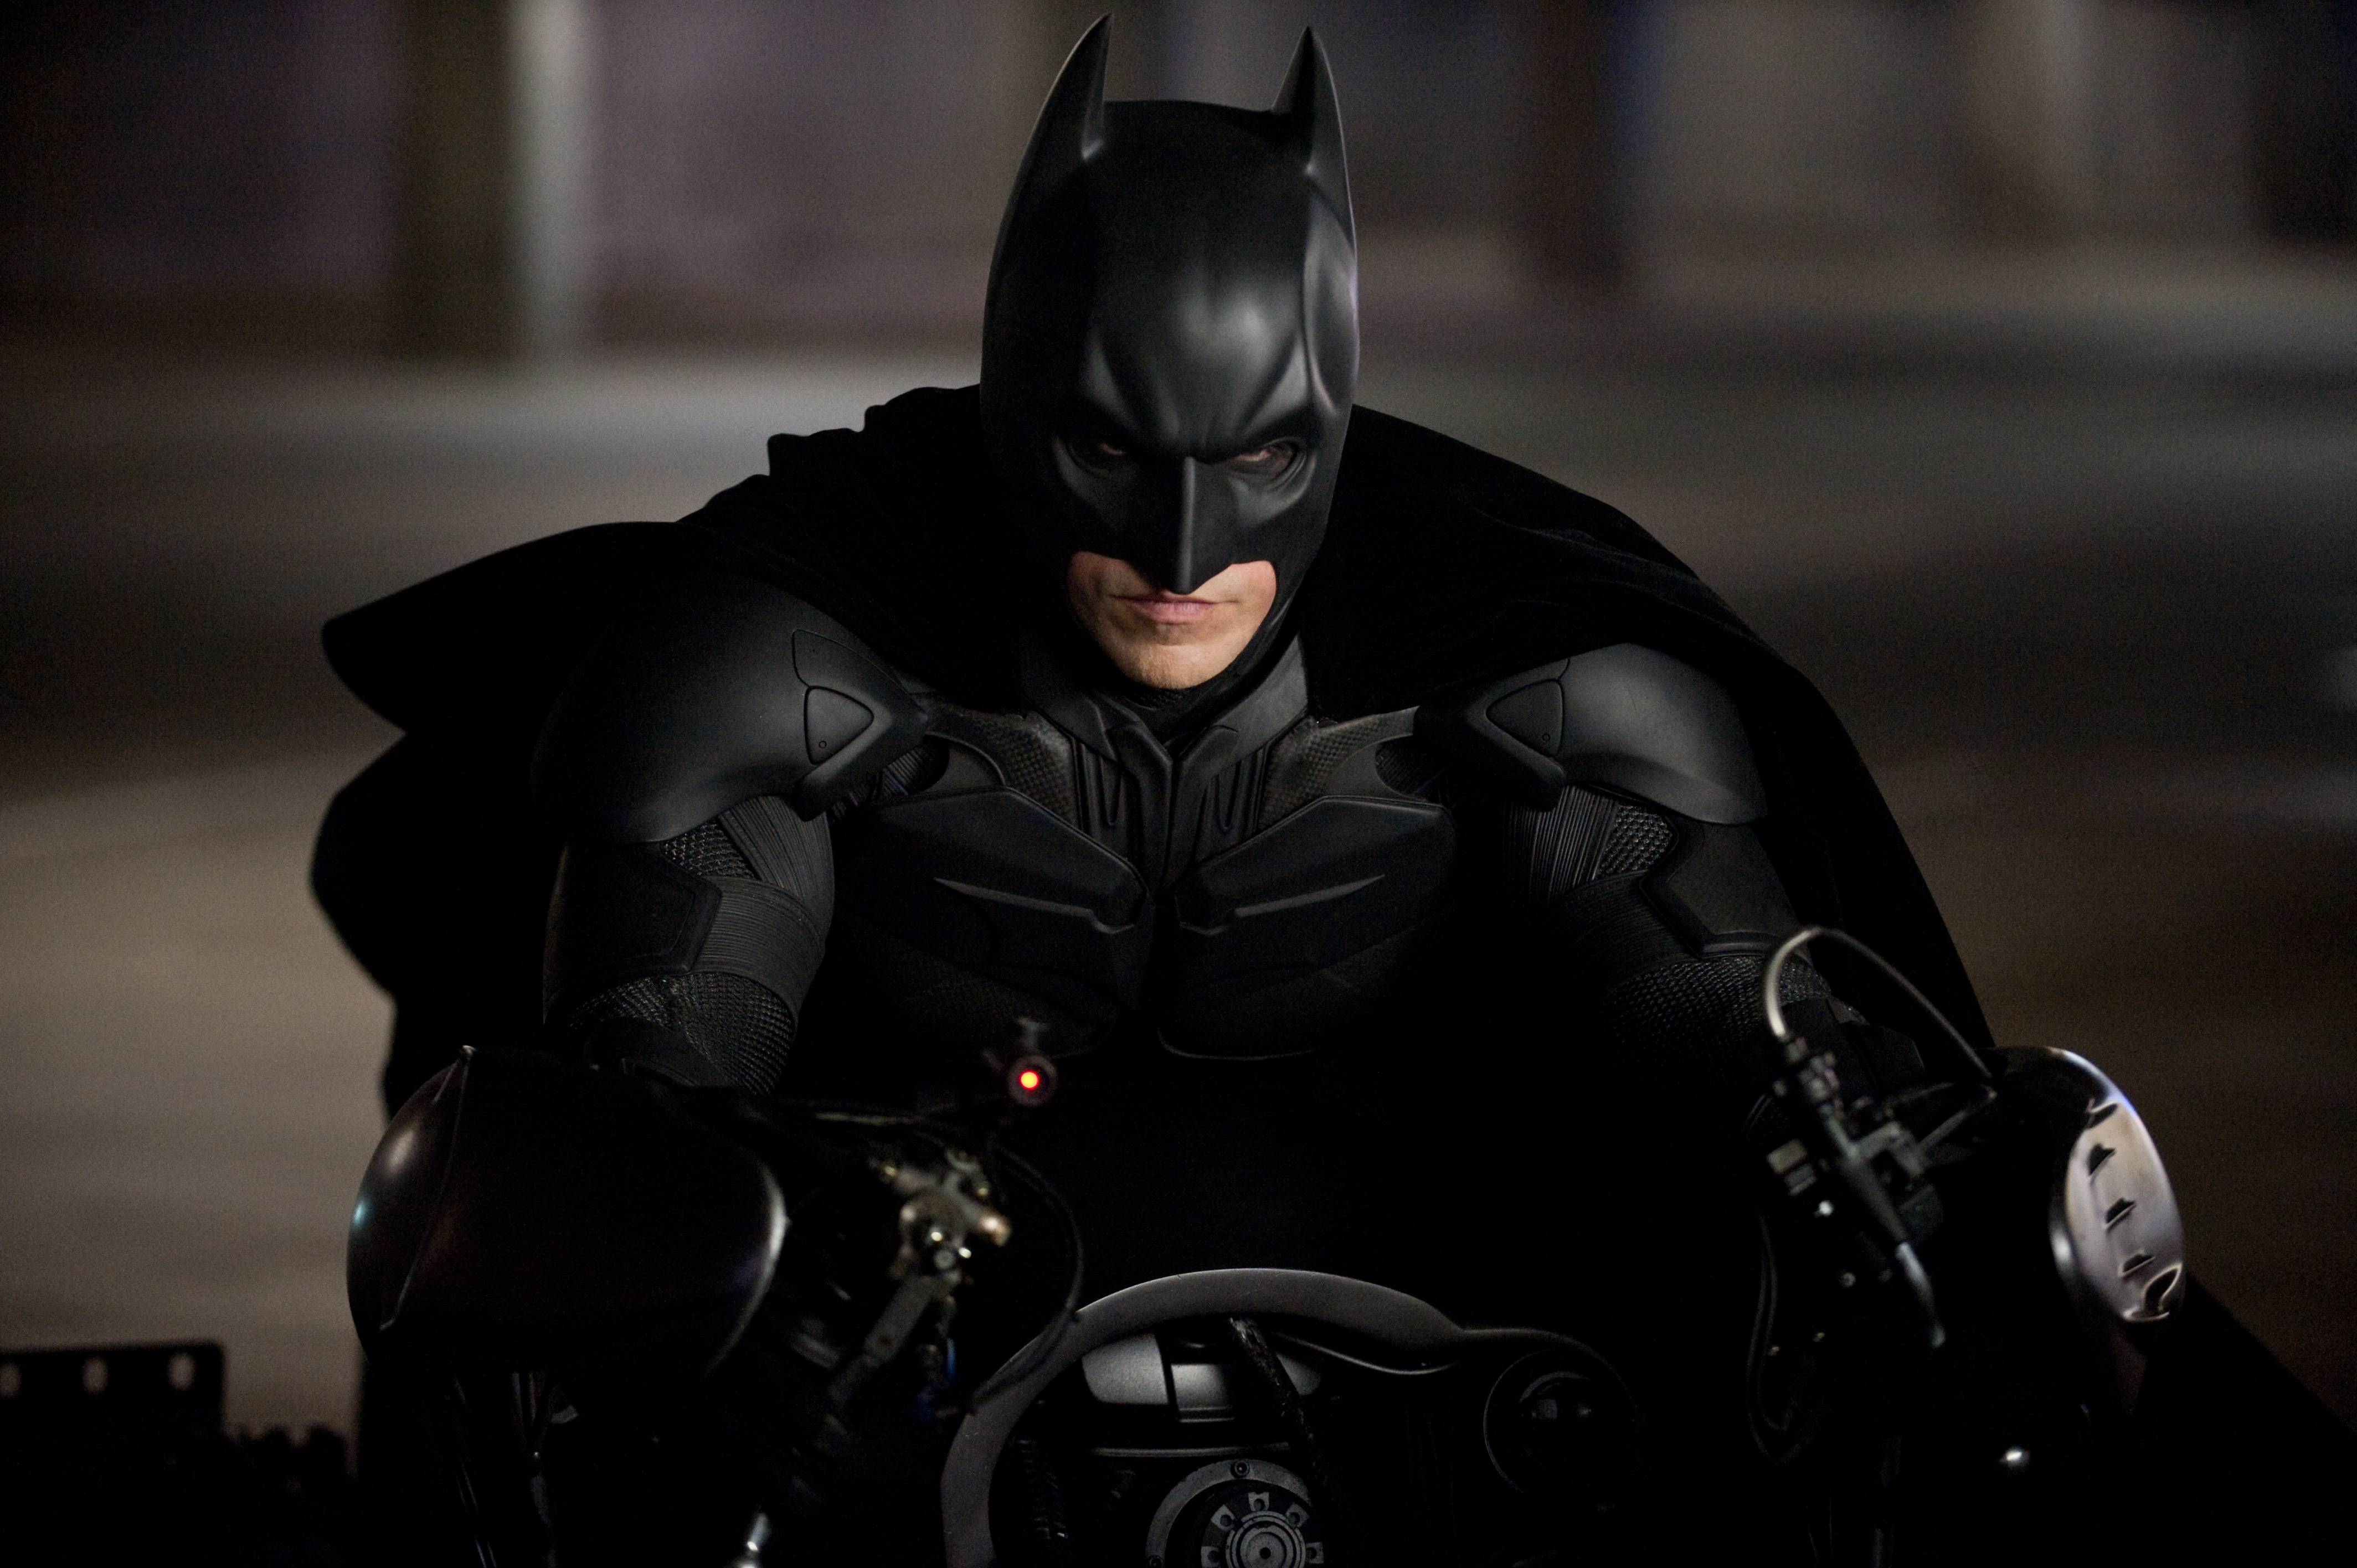 Batman Bike HD Live Wallpaper Download - Batman Bike HD Live ...